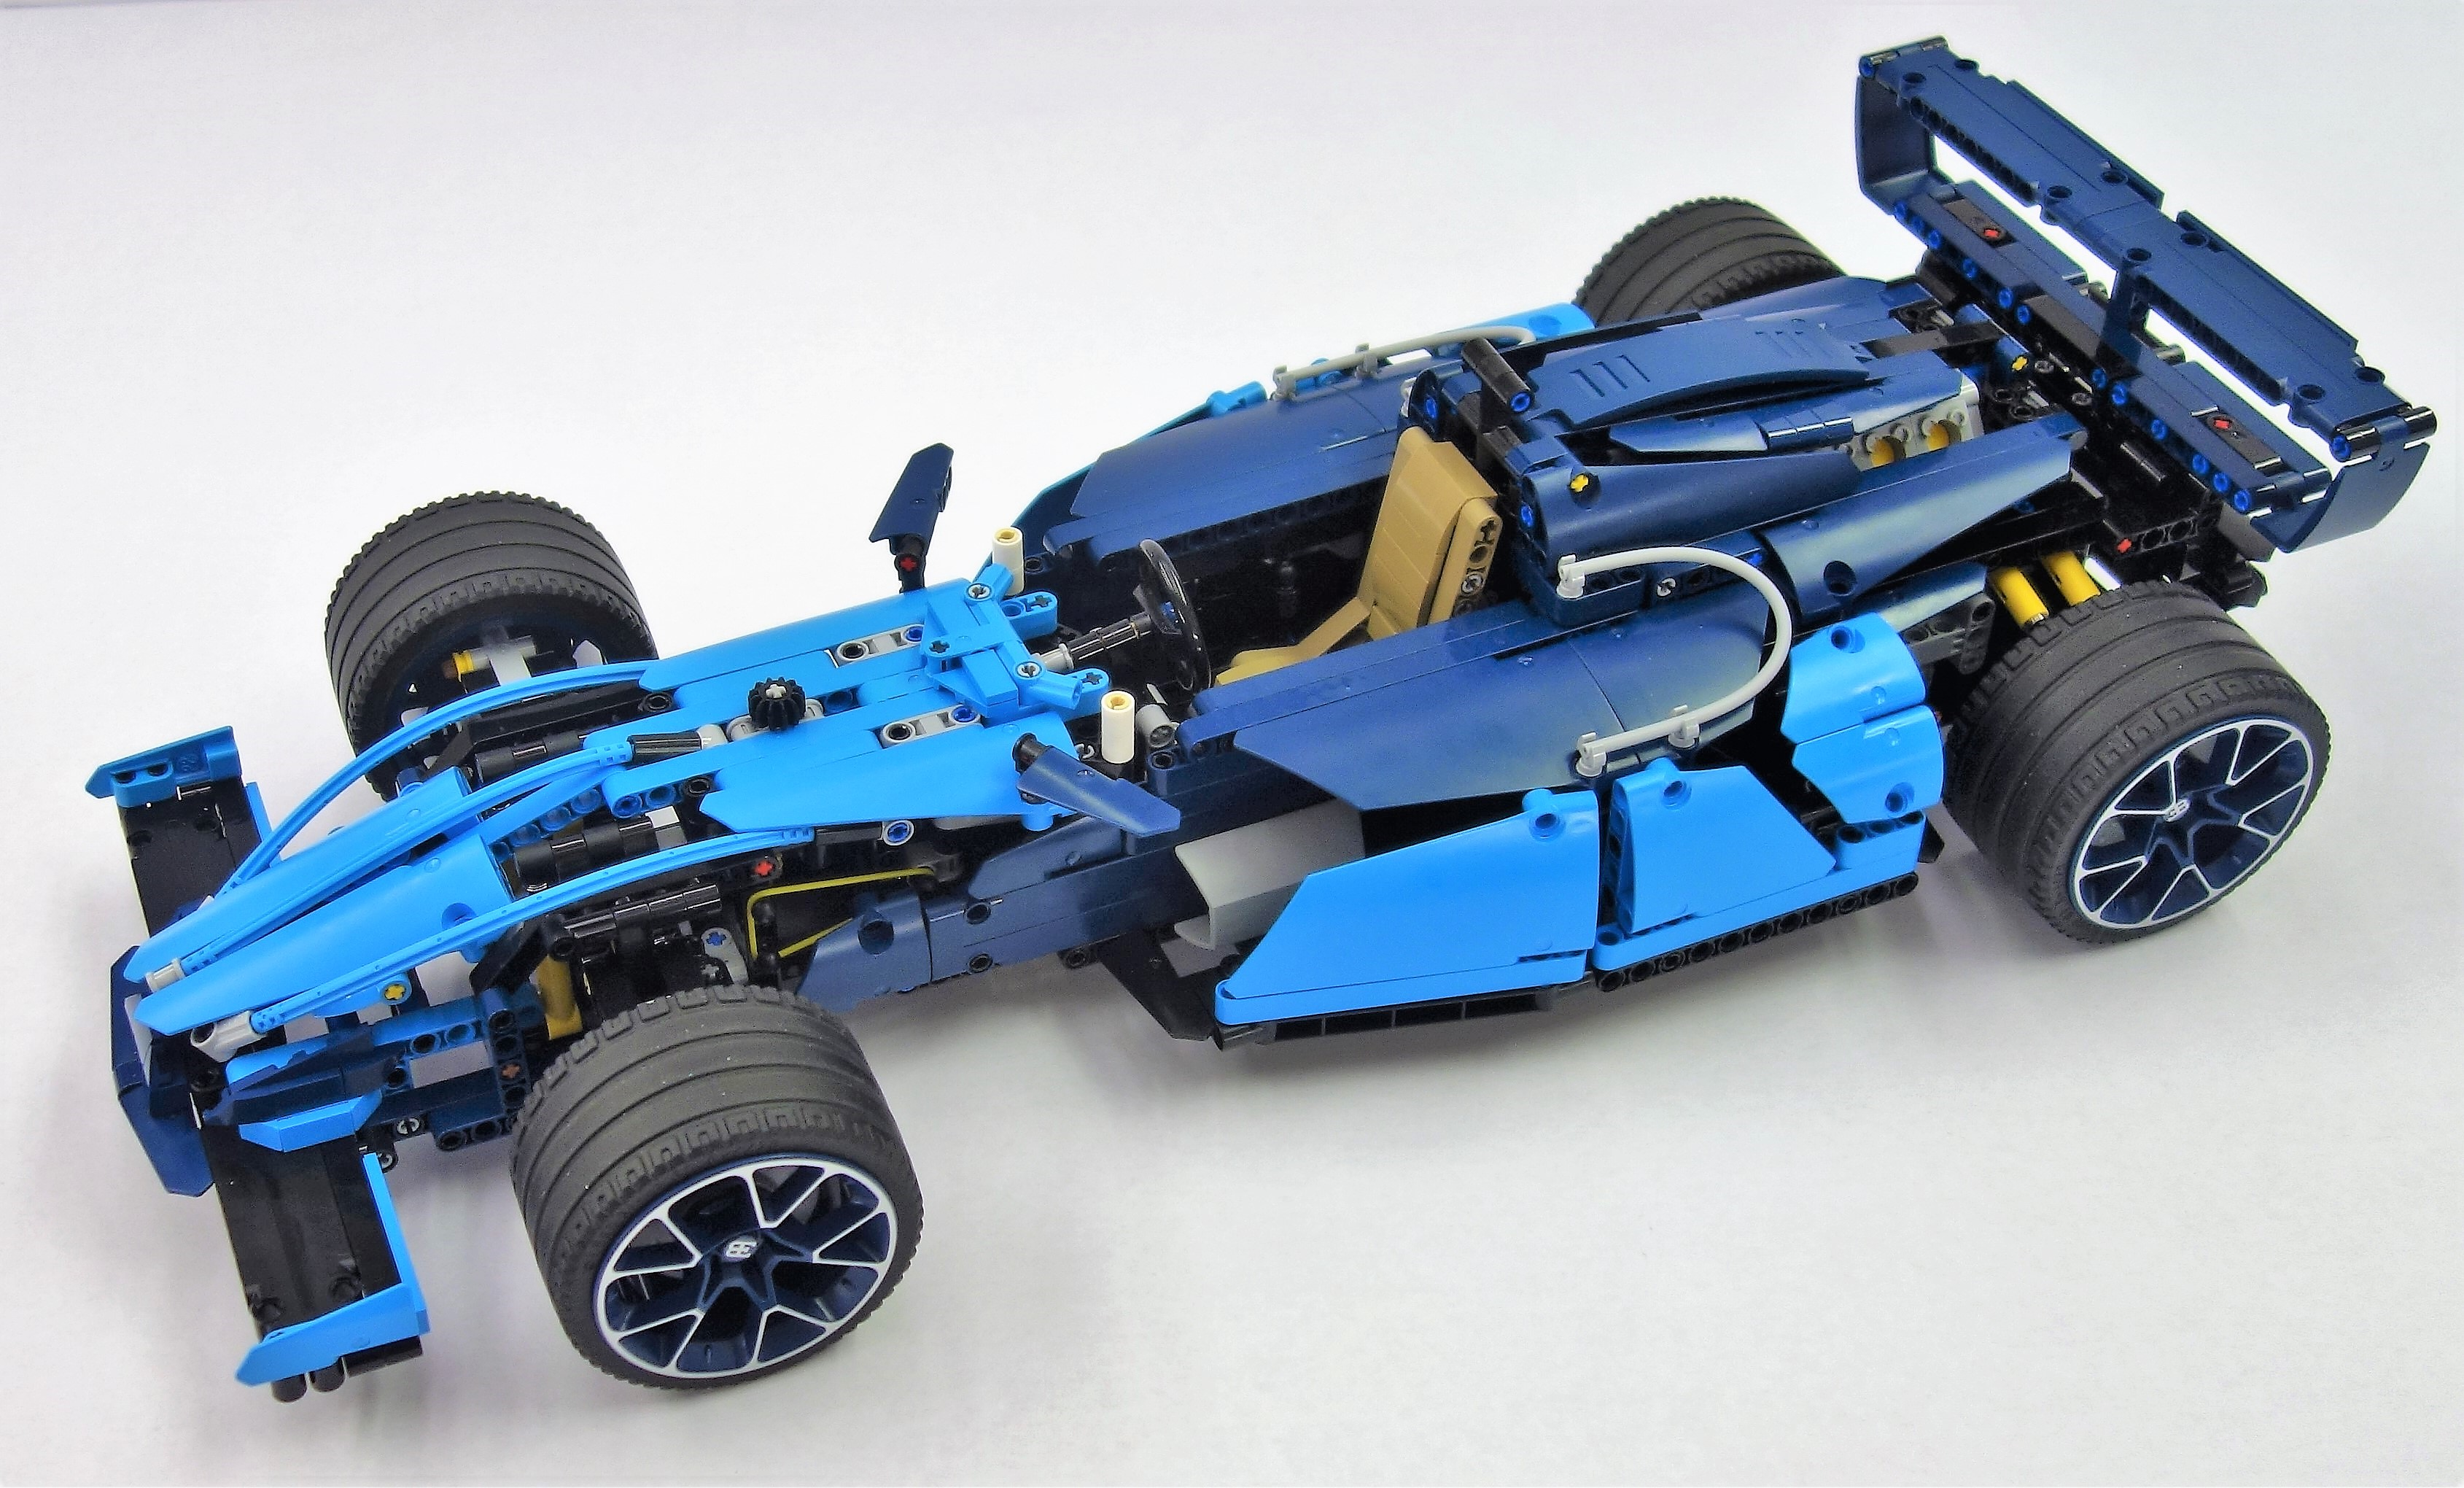 lego technic 42083 b model the lego car blog. Black Bedroom Furniture Sets. Home Design Ideas